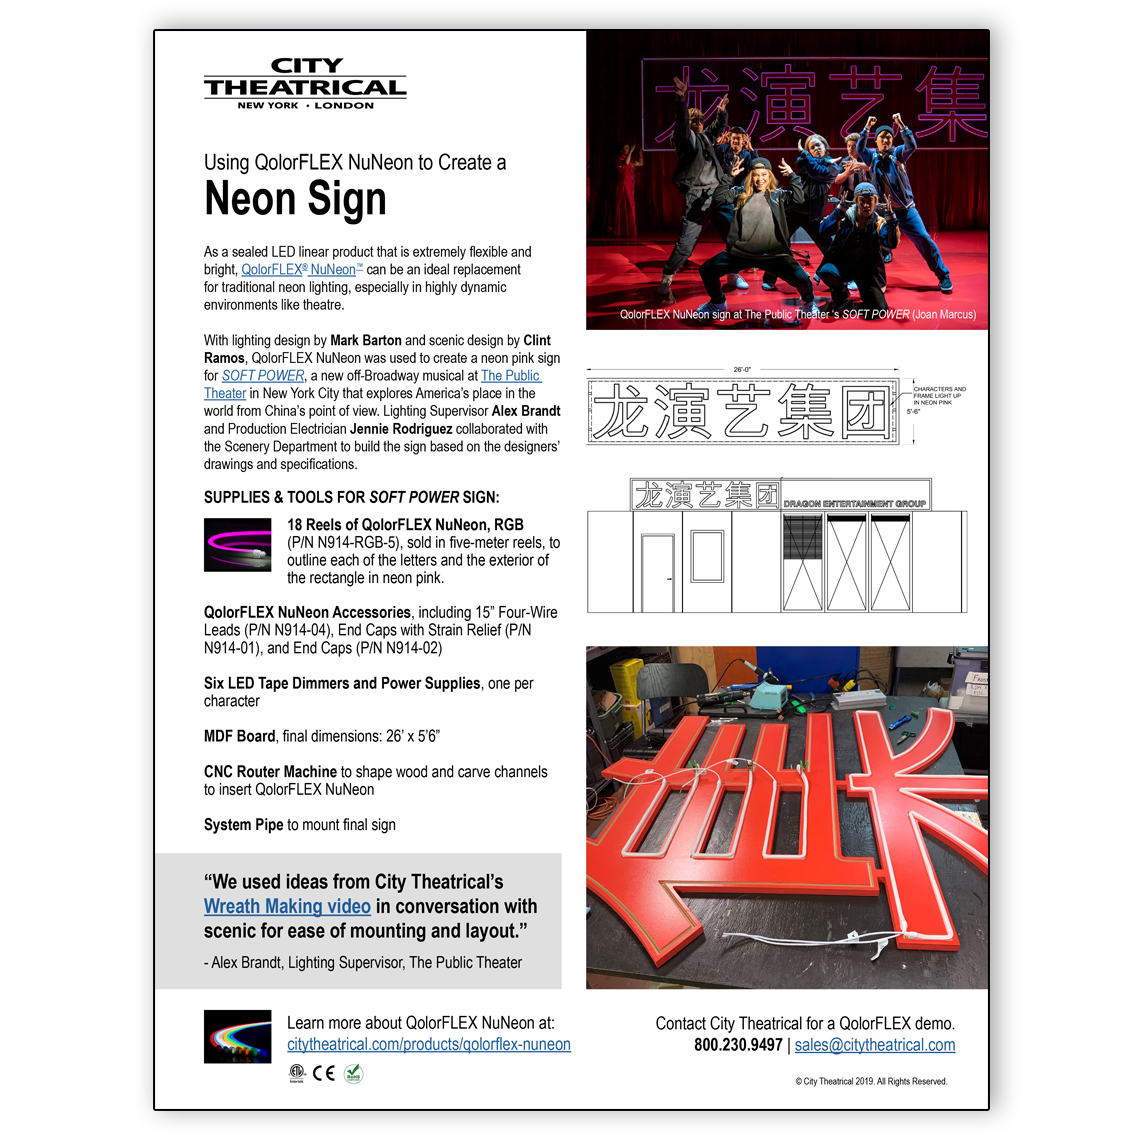 How to Create a Neon Sign Using QolorFLEX NuNeon